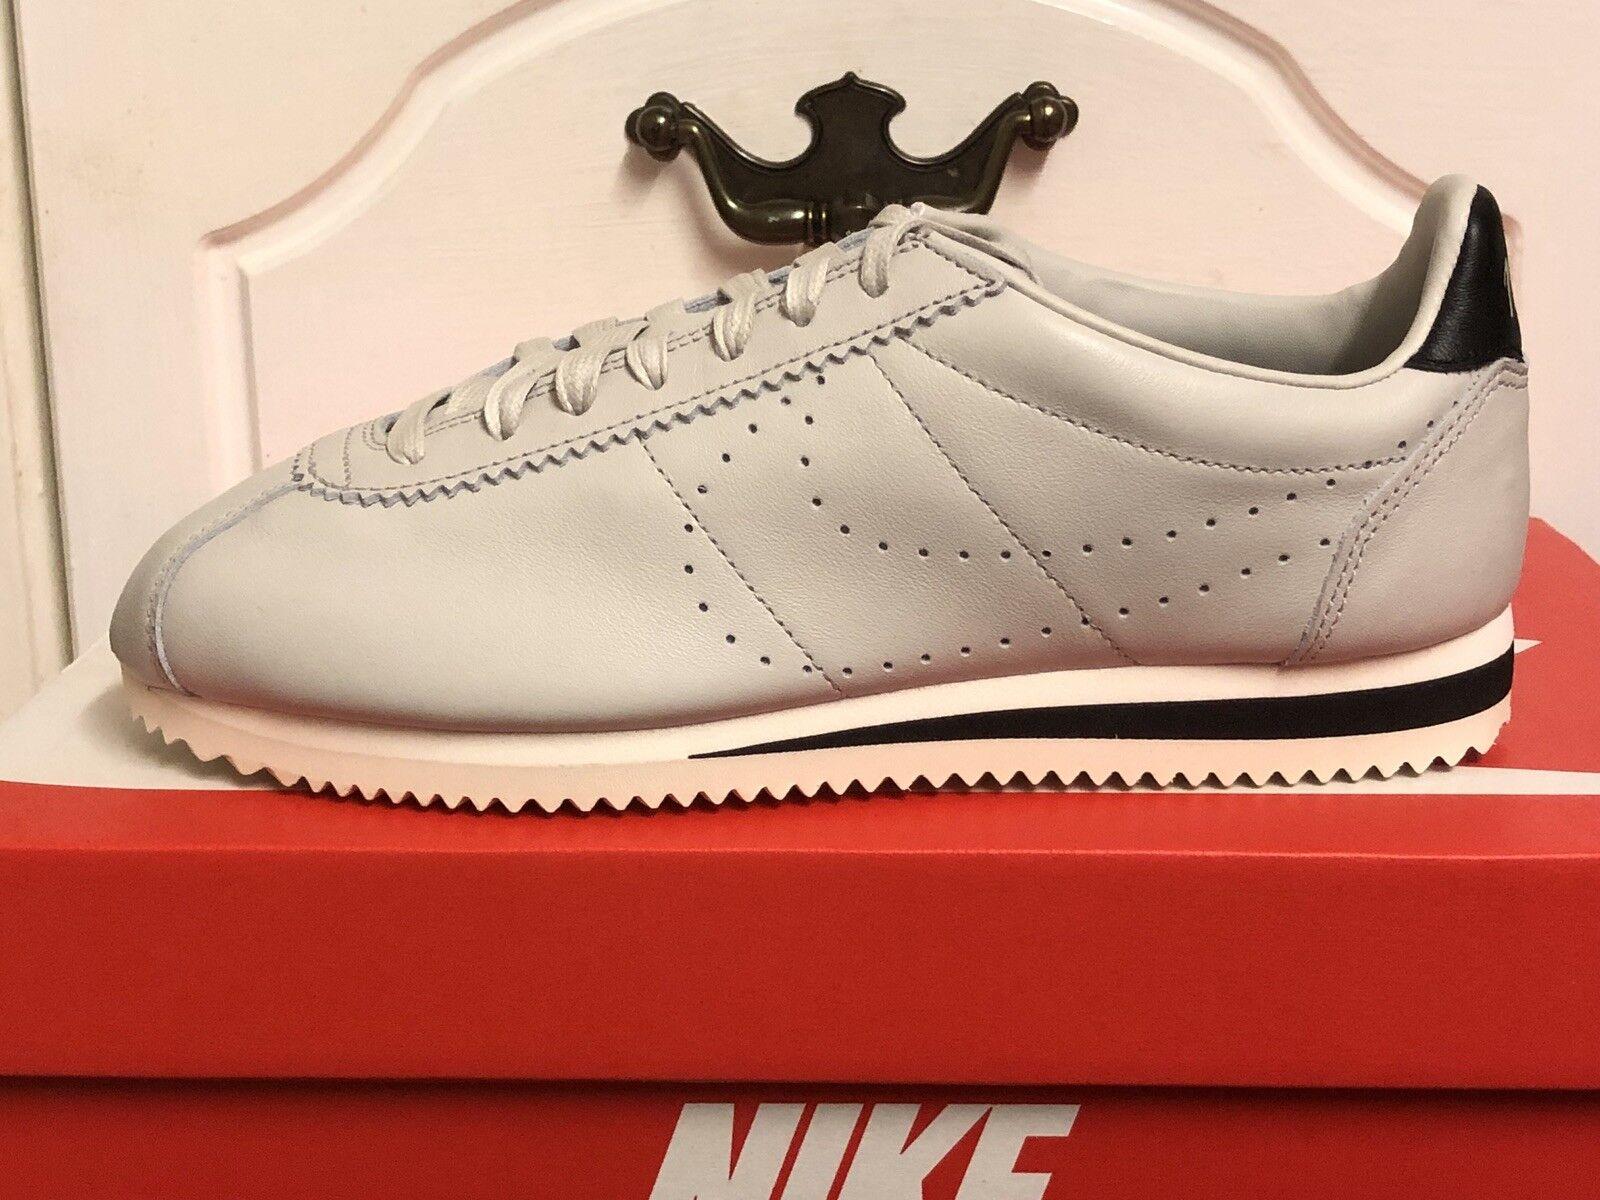 NIKE CLASSIC CORTEZ LEATHER PREM SNEAKERS  Herren  TRAINERS SNEAKERS PREM Schuhe UK 6 EUR 40 a6ba63